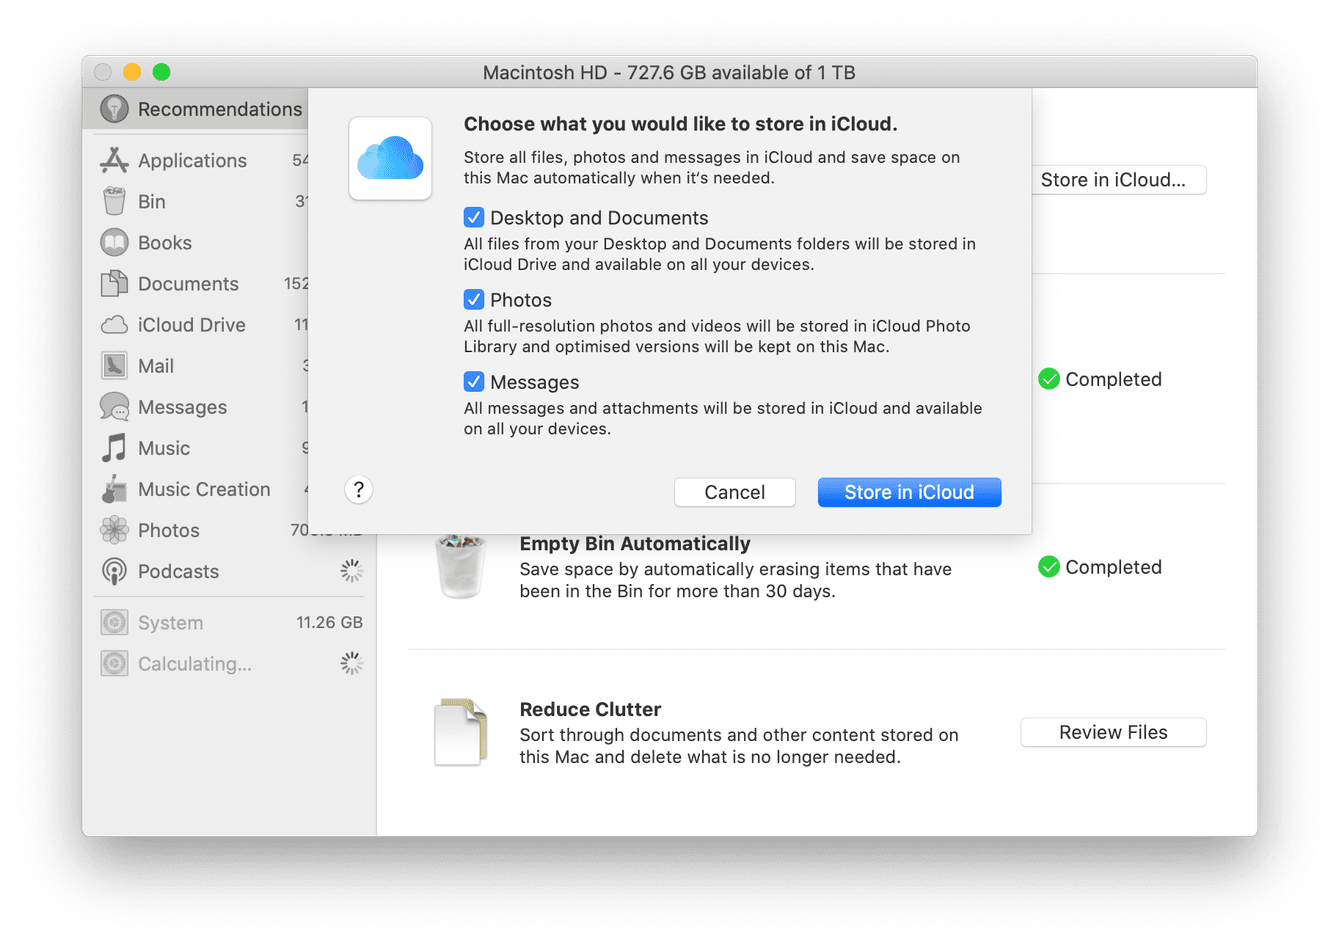 How to use iCloud drive